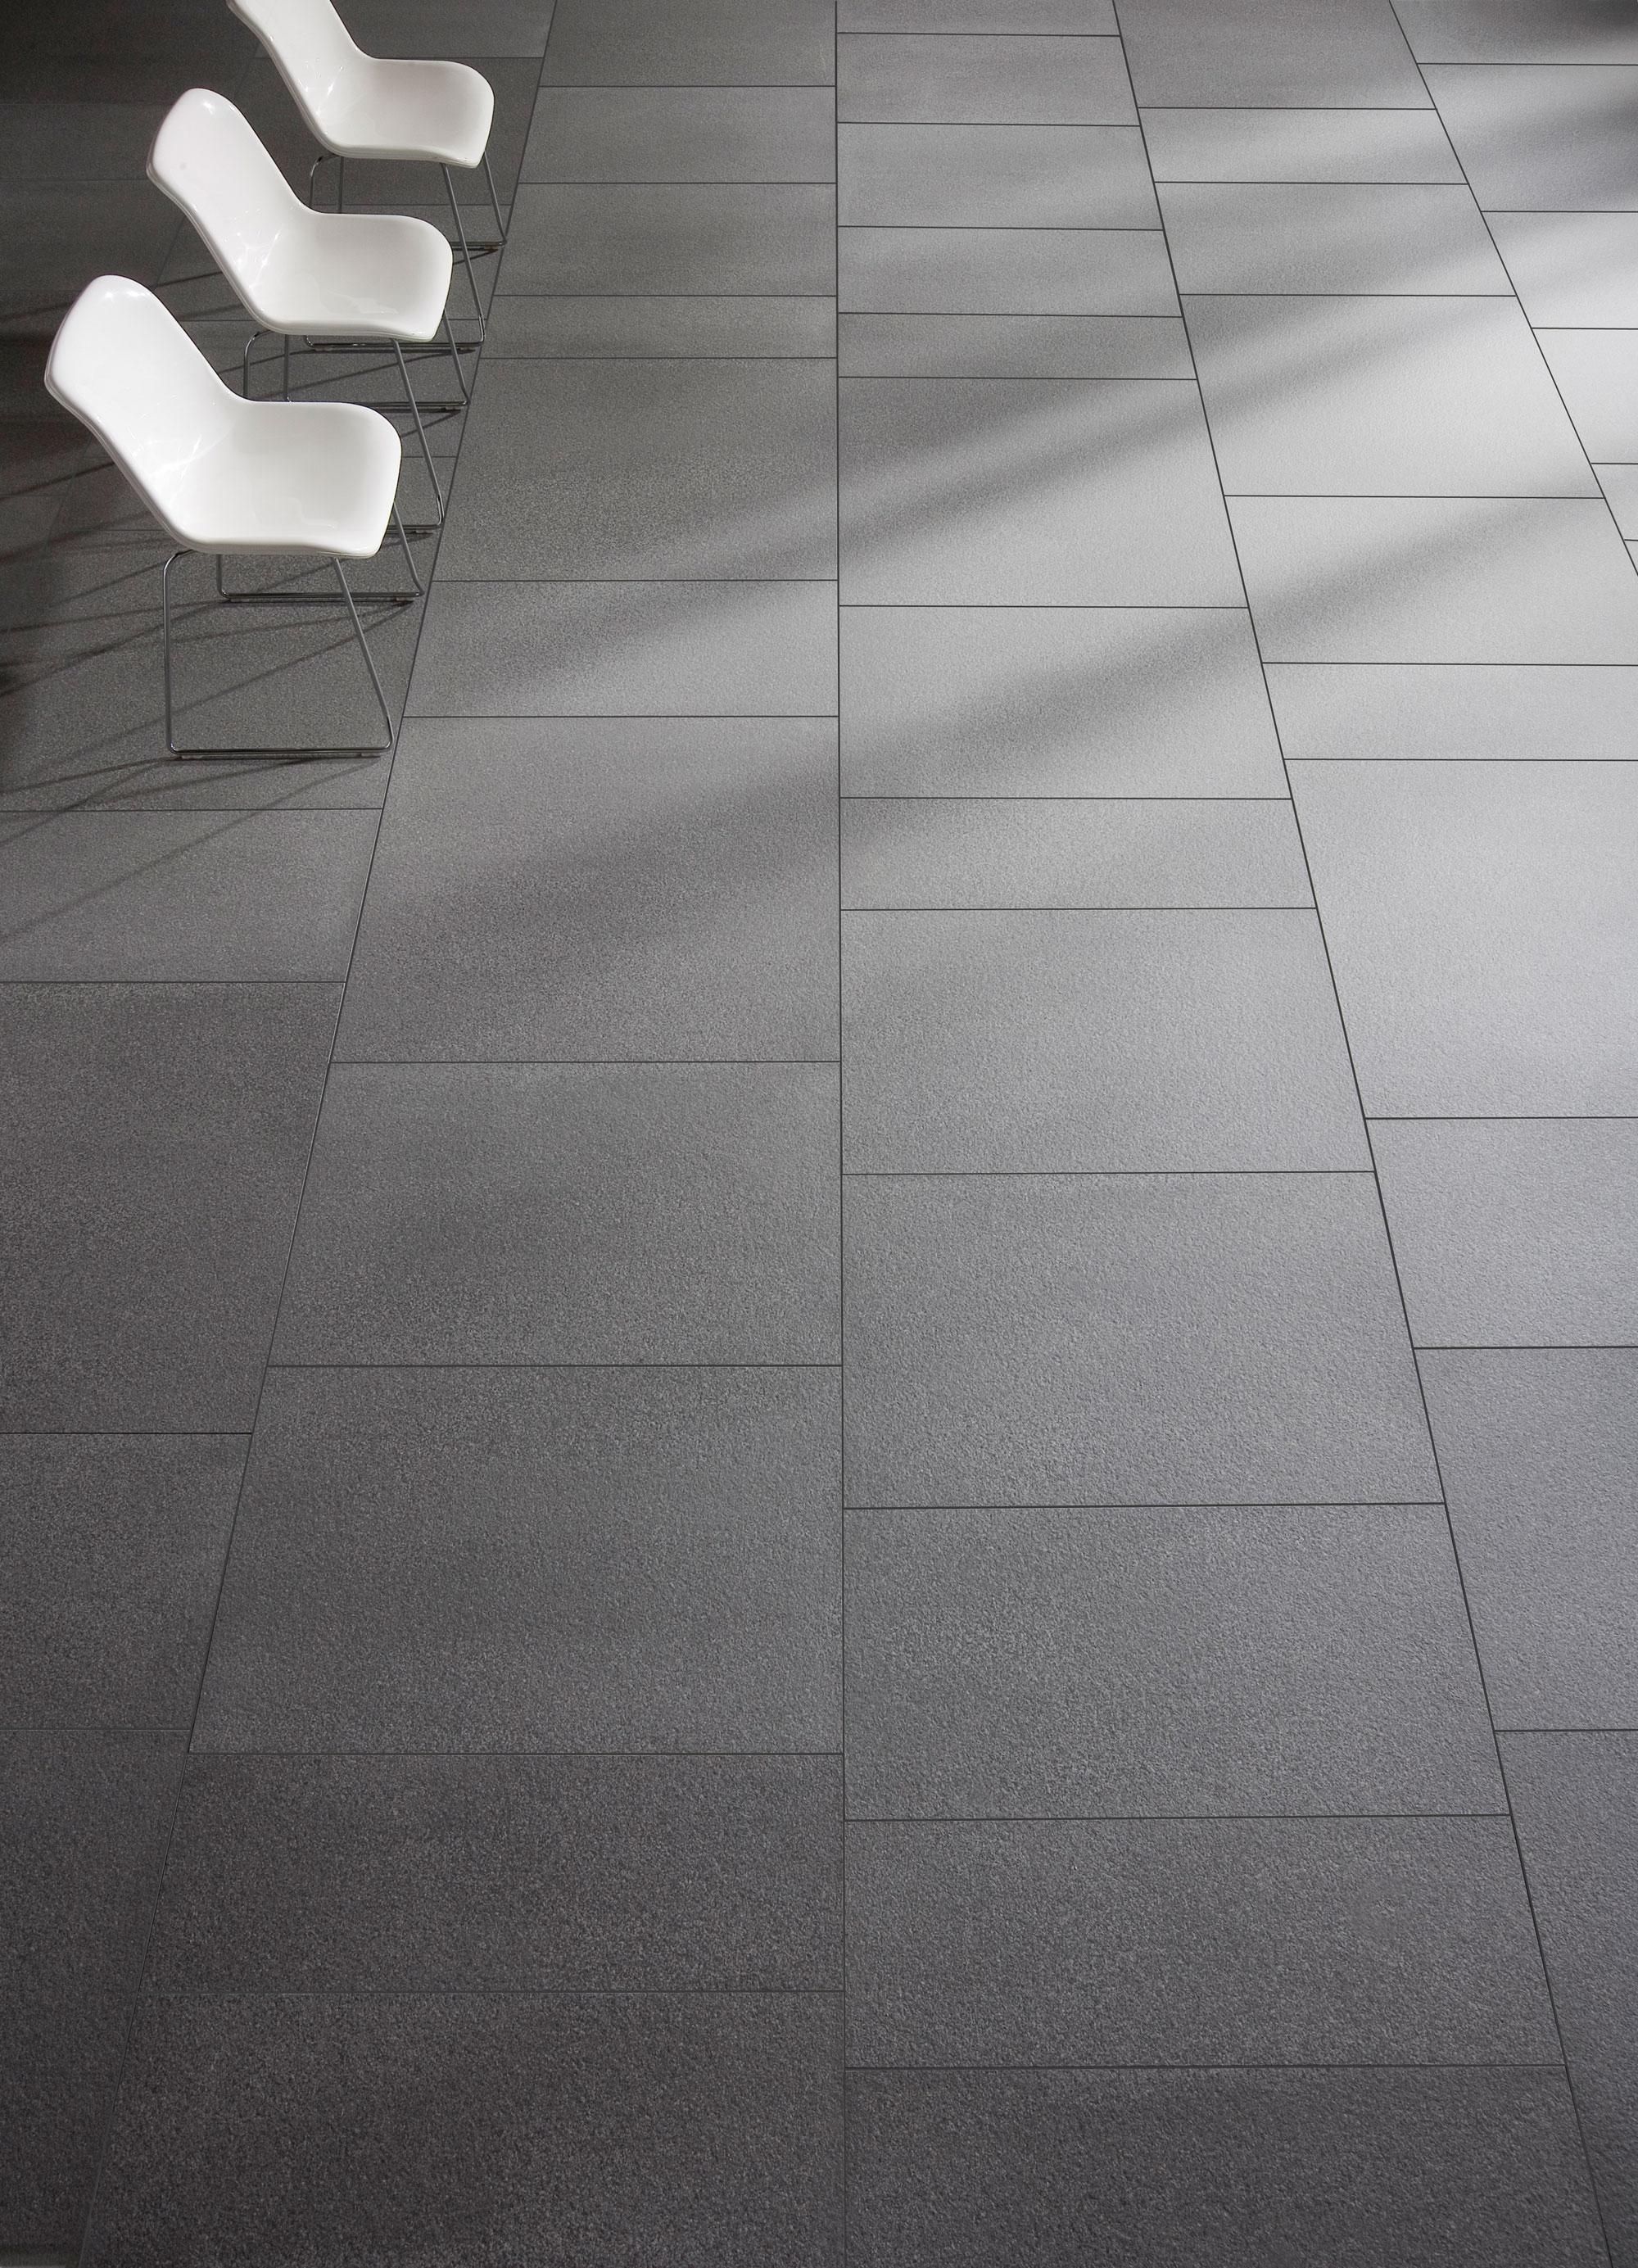 mosa quartz carrelage pour sol de mosa architonic. Black Bedroom Furniture Sets. Home Design Ideas